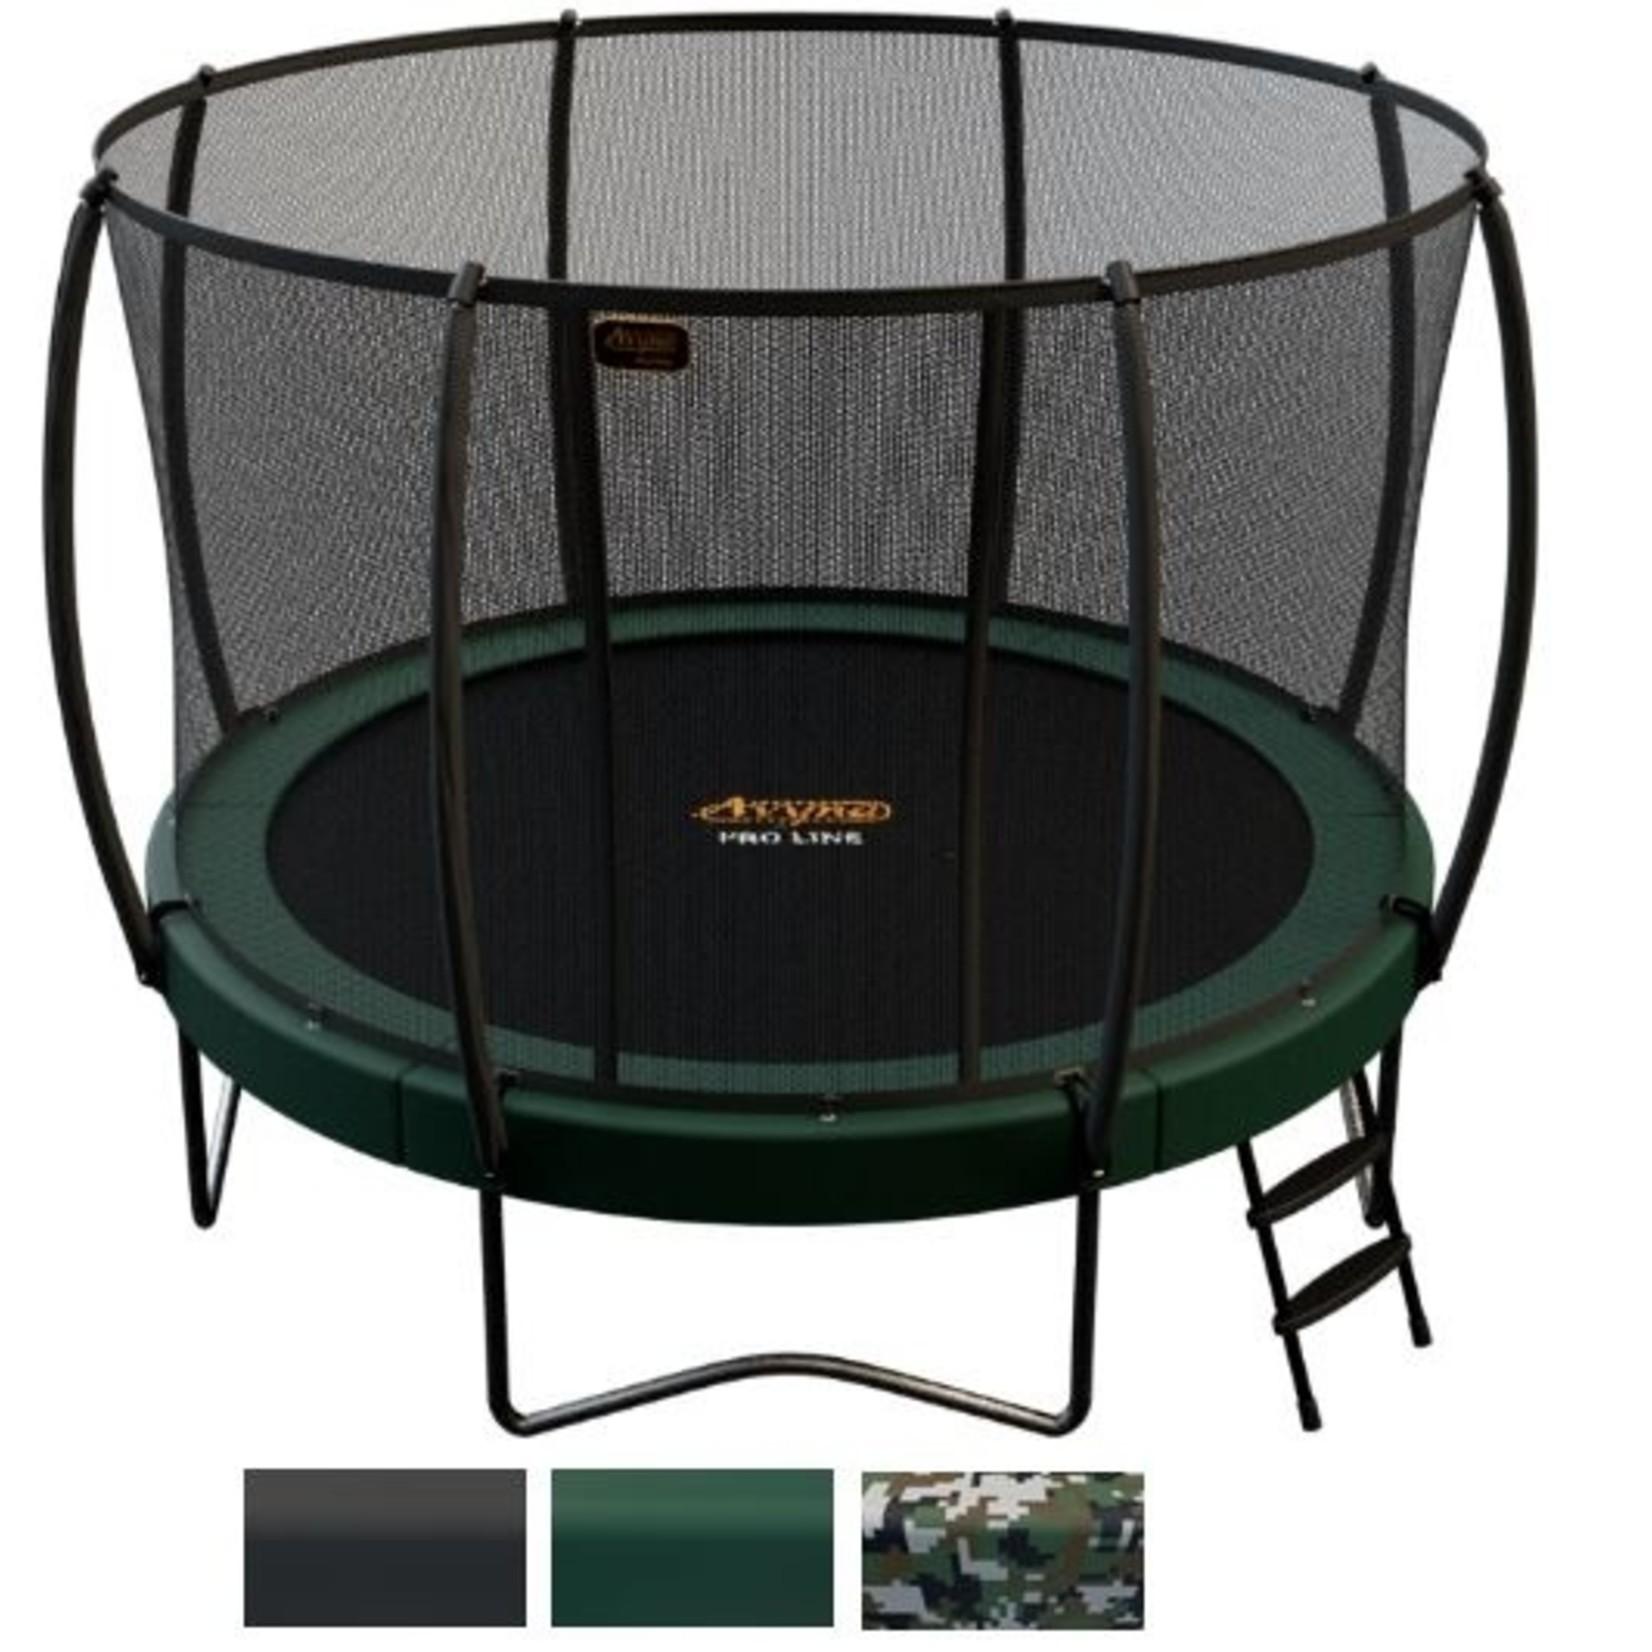 Ronde trampoline | Avyna Pro-Line Ø 430 cm